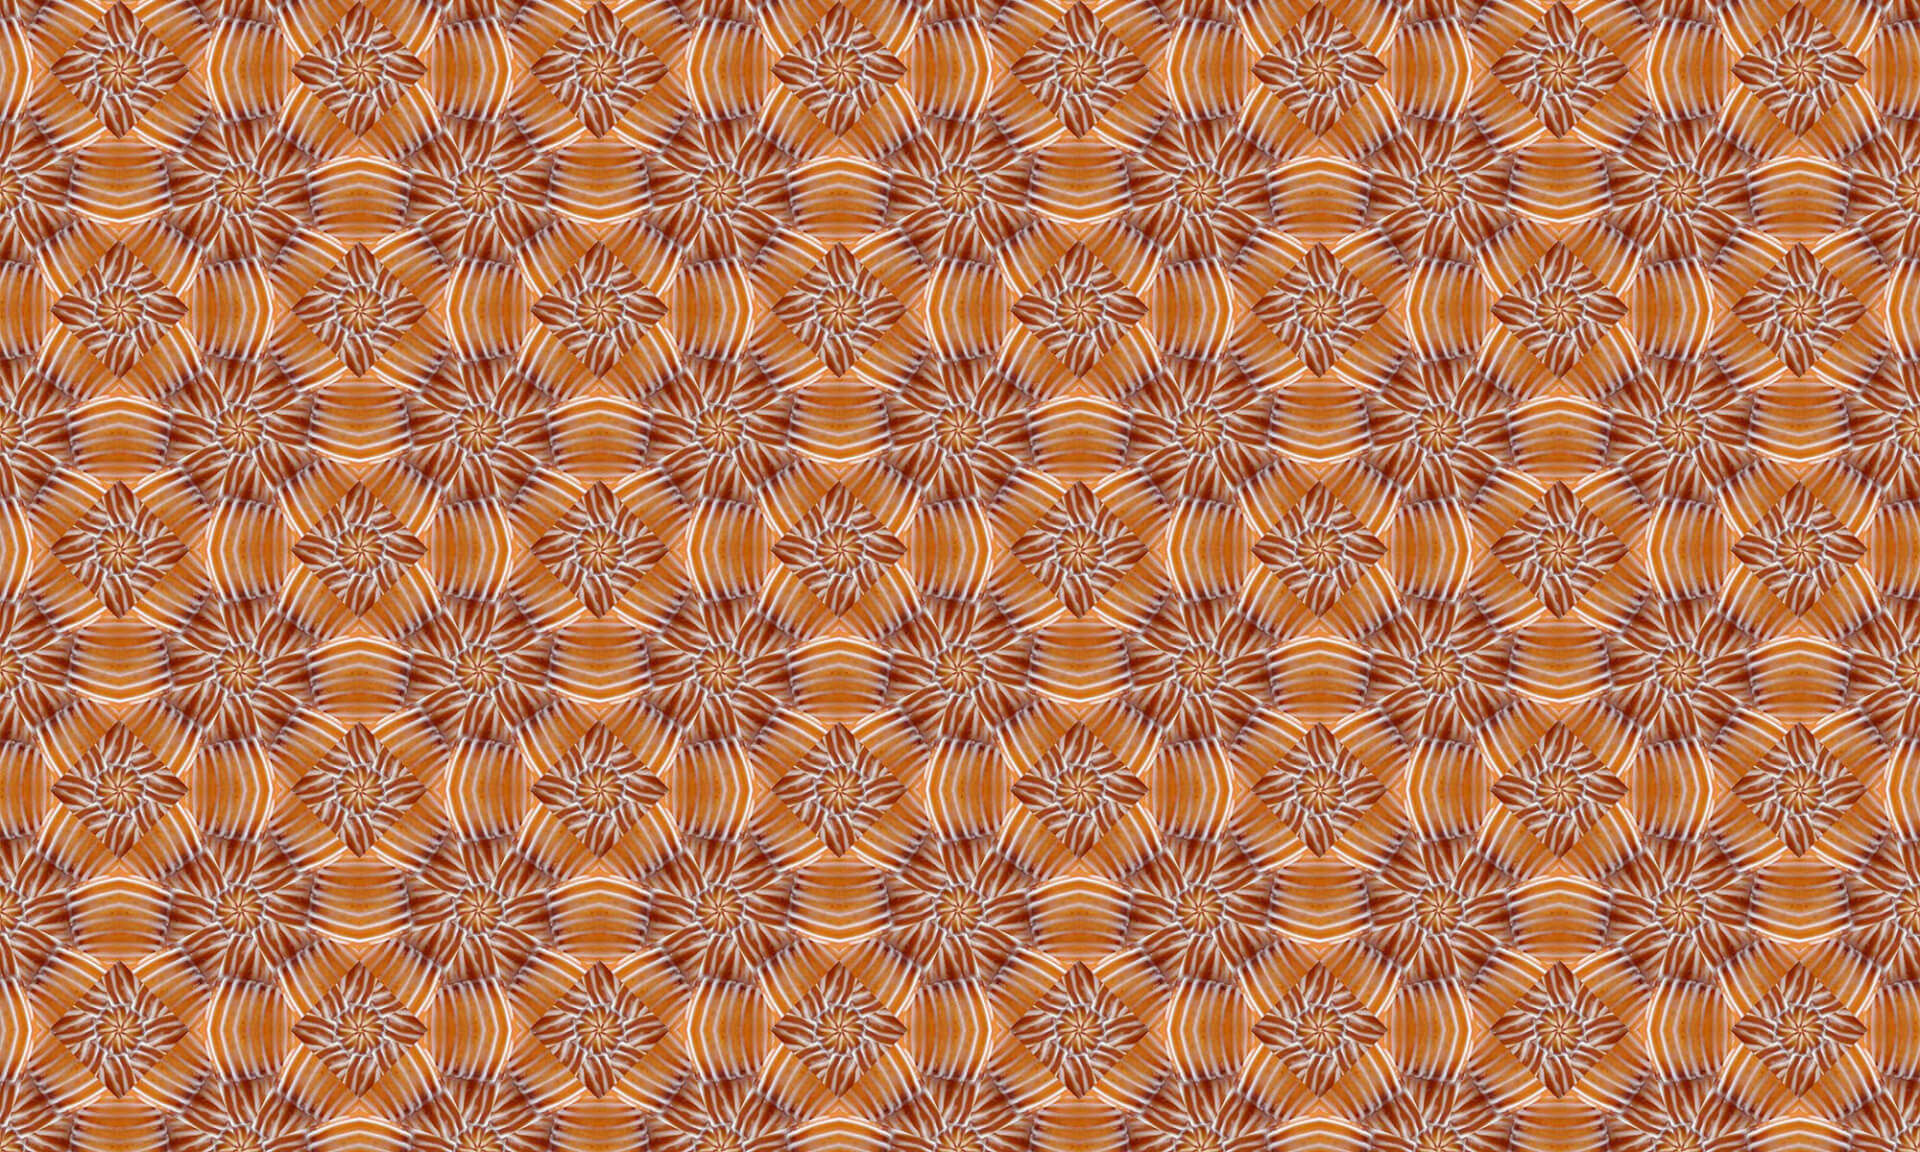 Pinwheel (BA0622) Doug Garrabrants